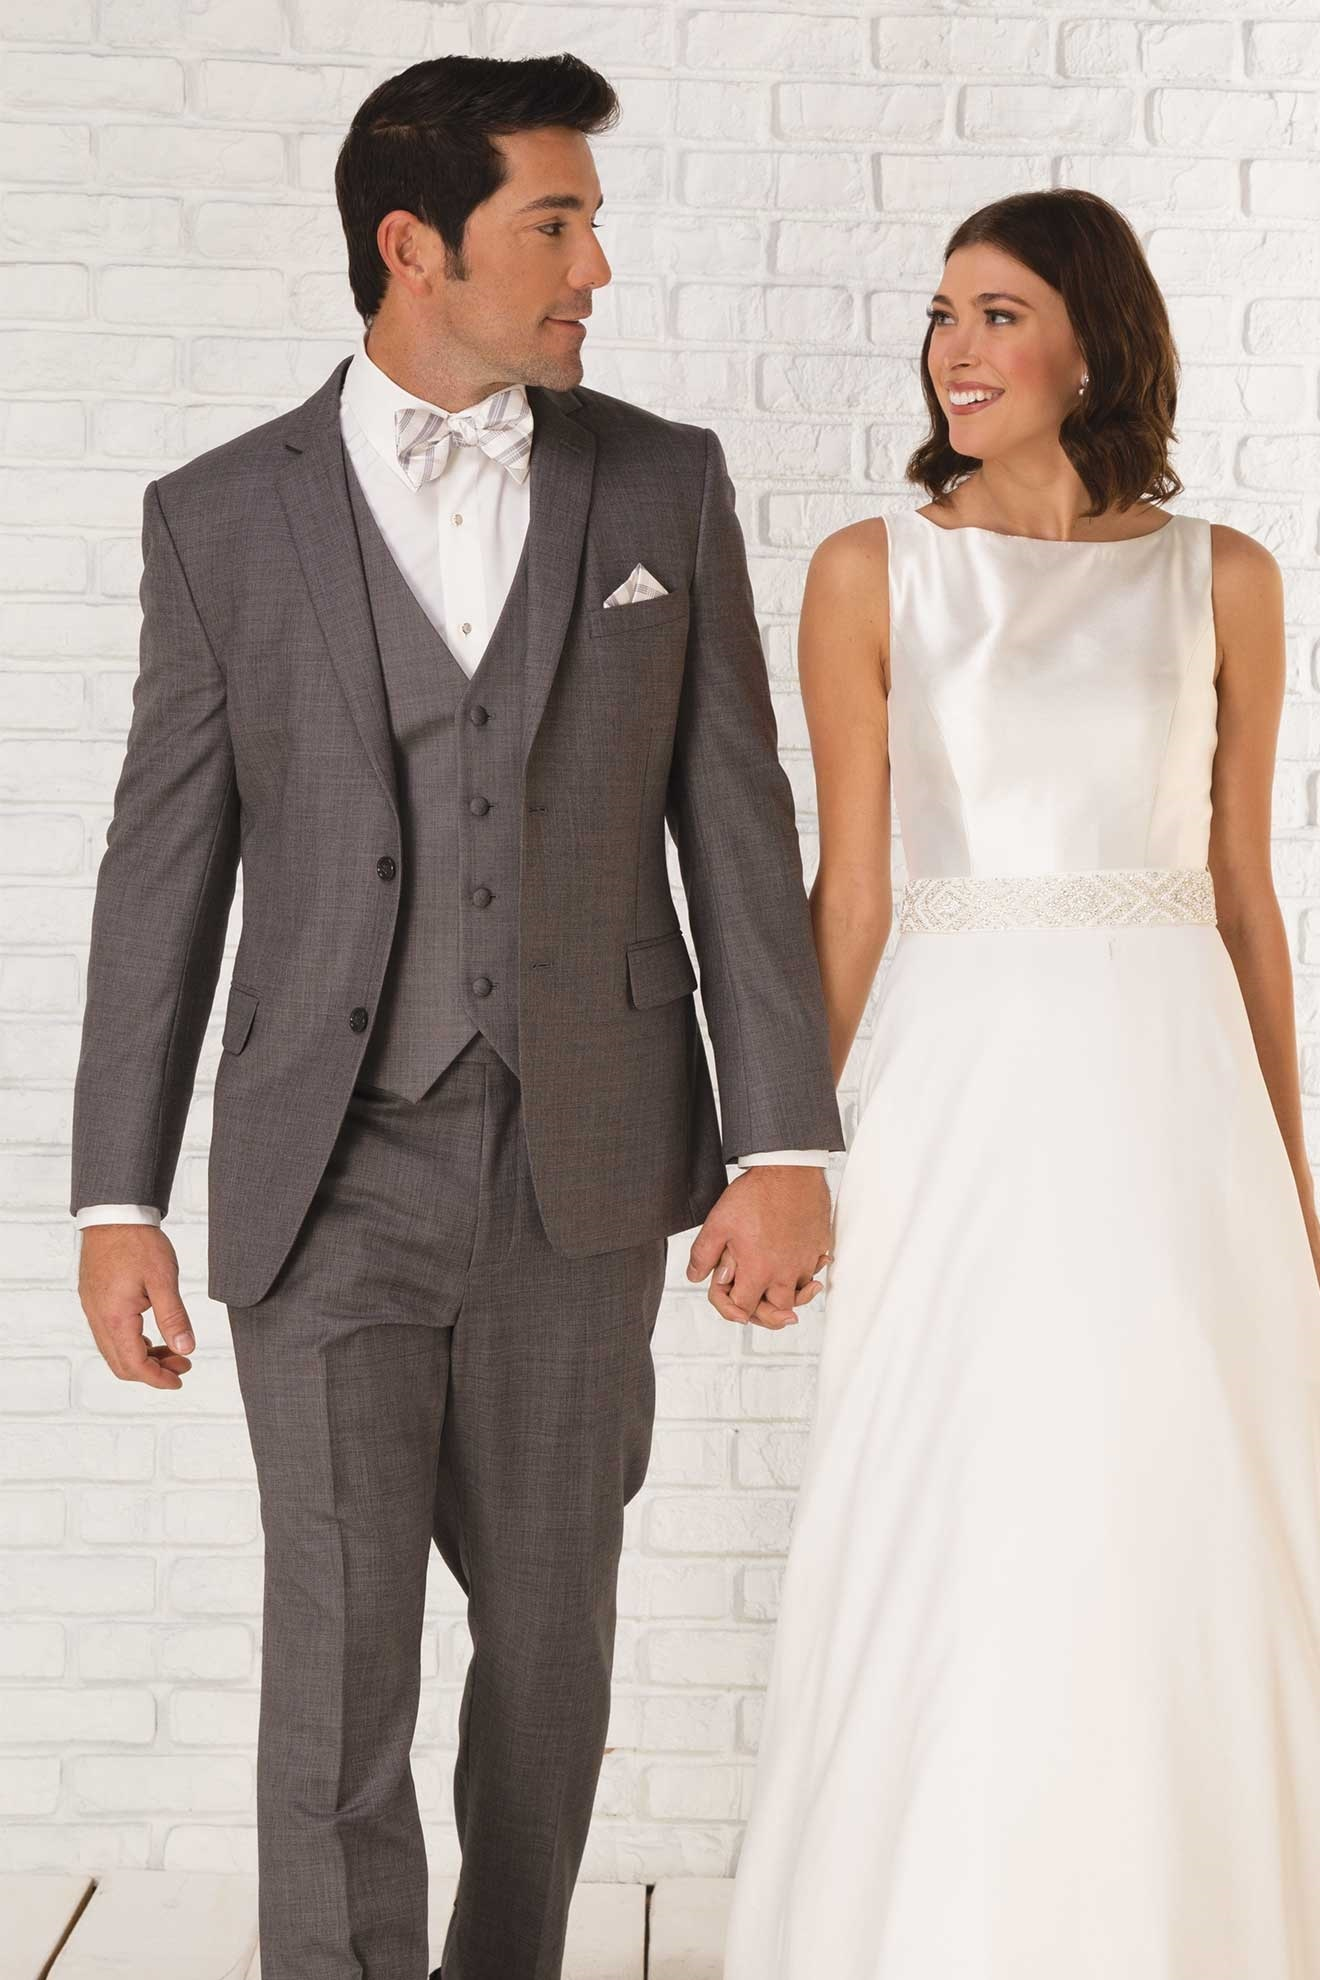 MFWtux.com - Grey Smoke GiNovia Moda Suit